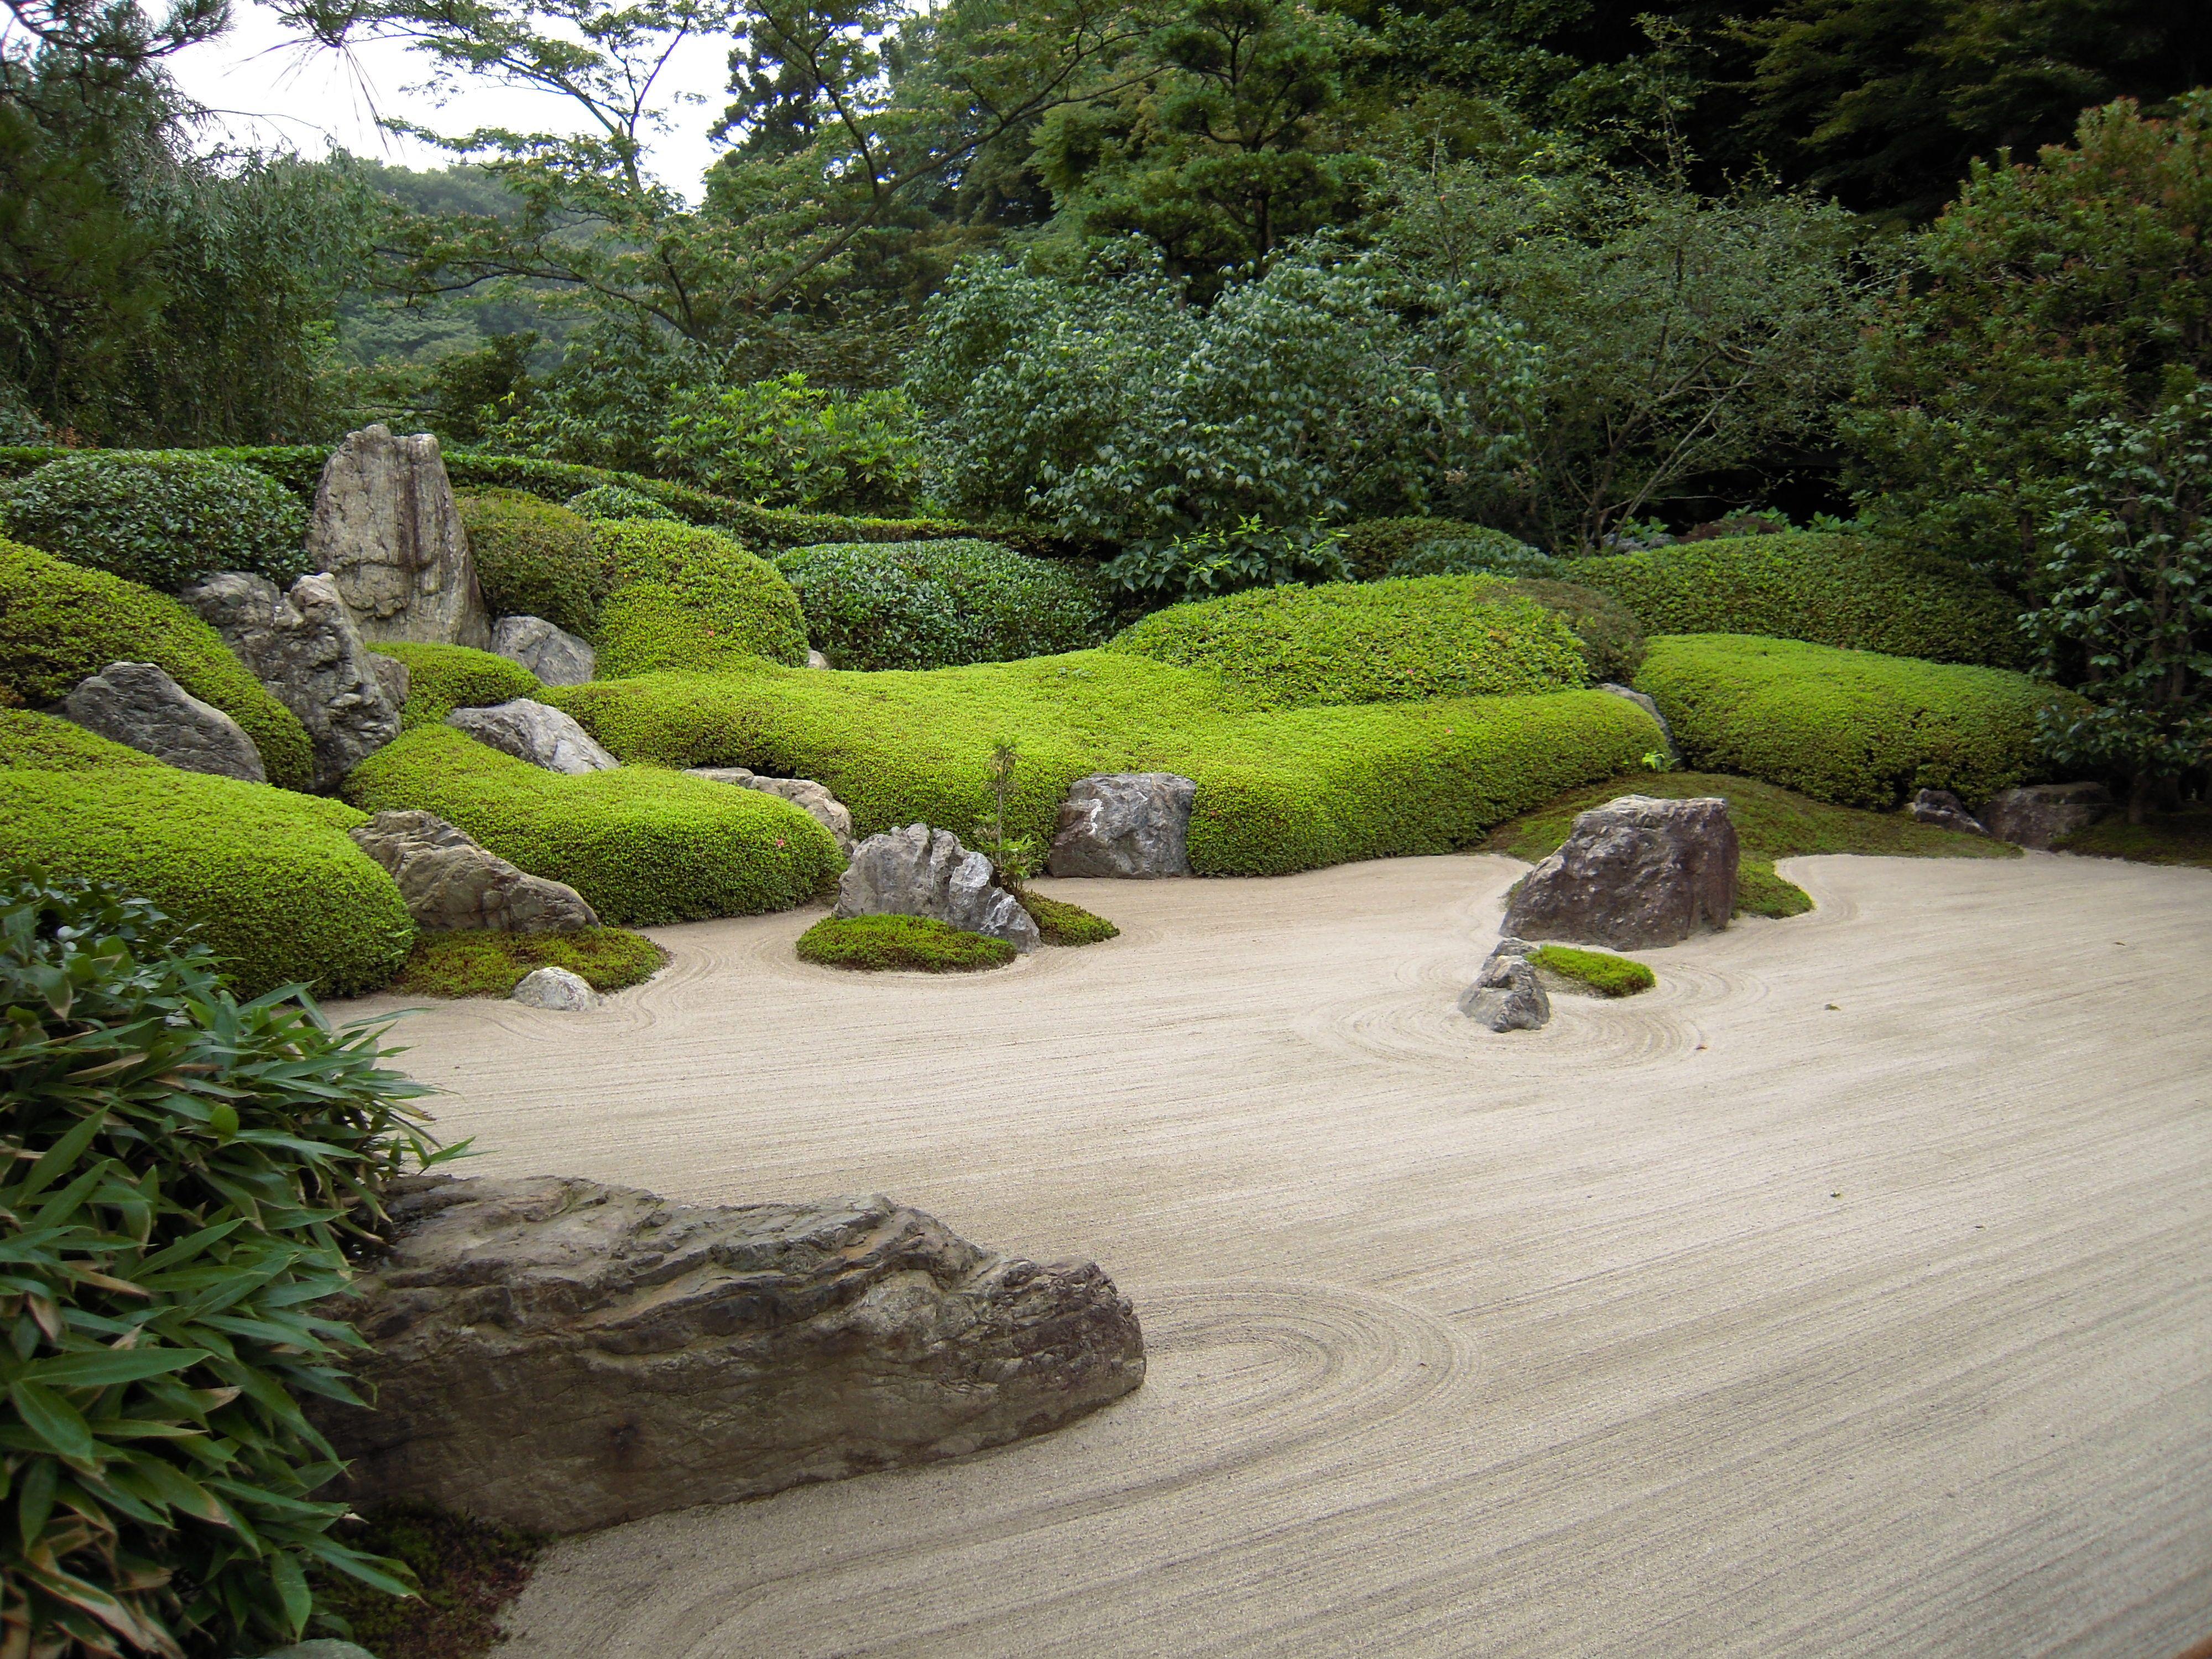 japanese zen garden g creative japanese outdoor structures zen gardens pinterest. Black Bedroom Furniture Sets. Home Design Ideas